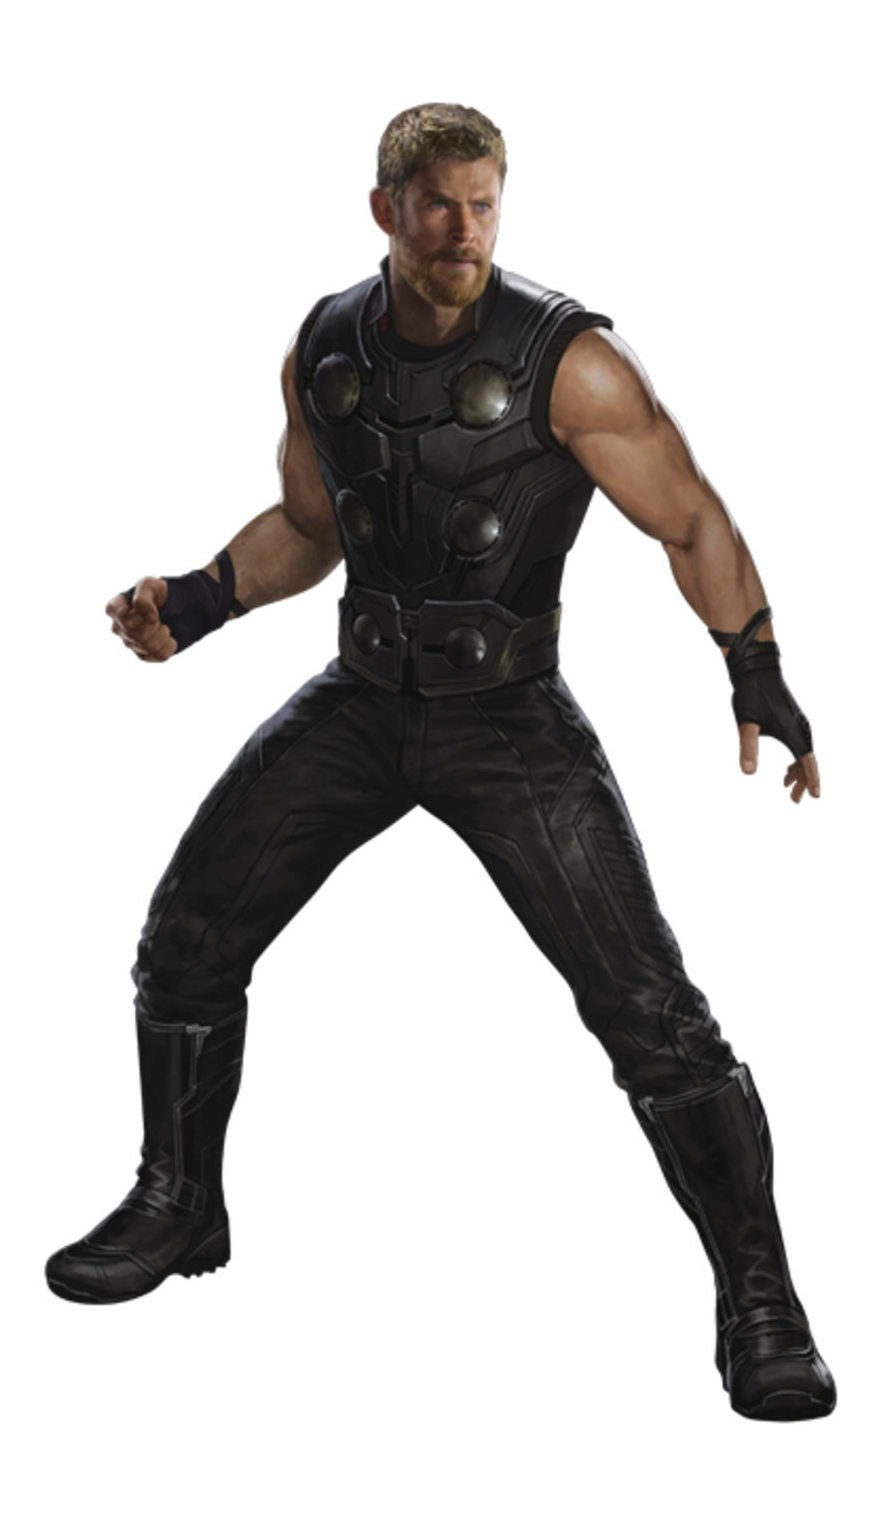 Avengers Infinity War Promo Art - Thor